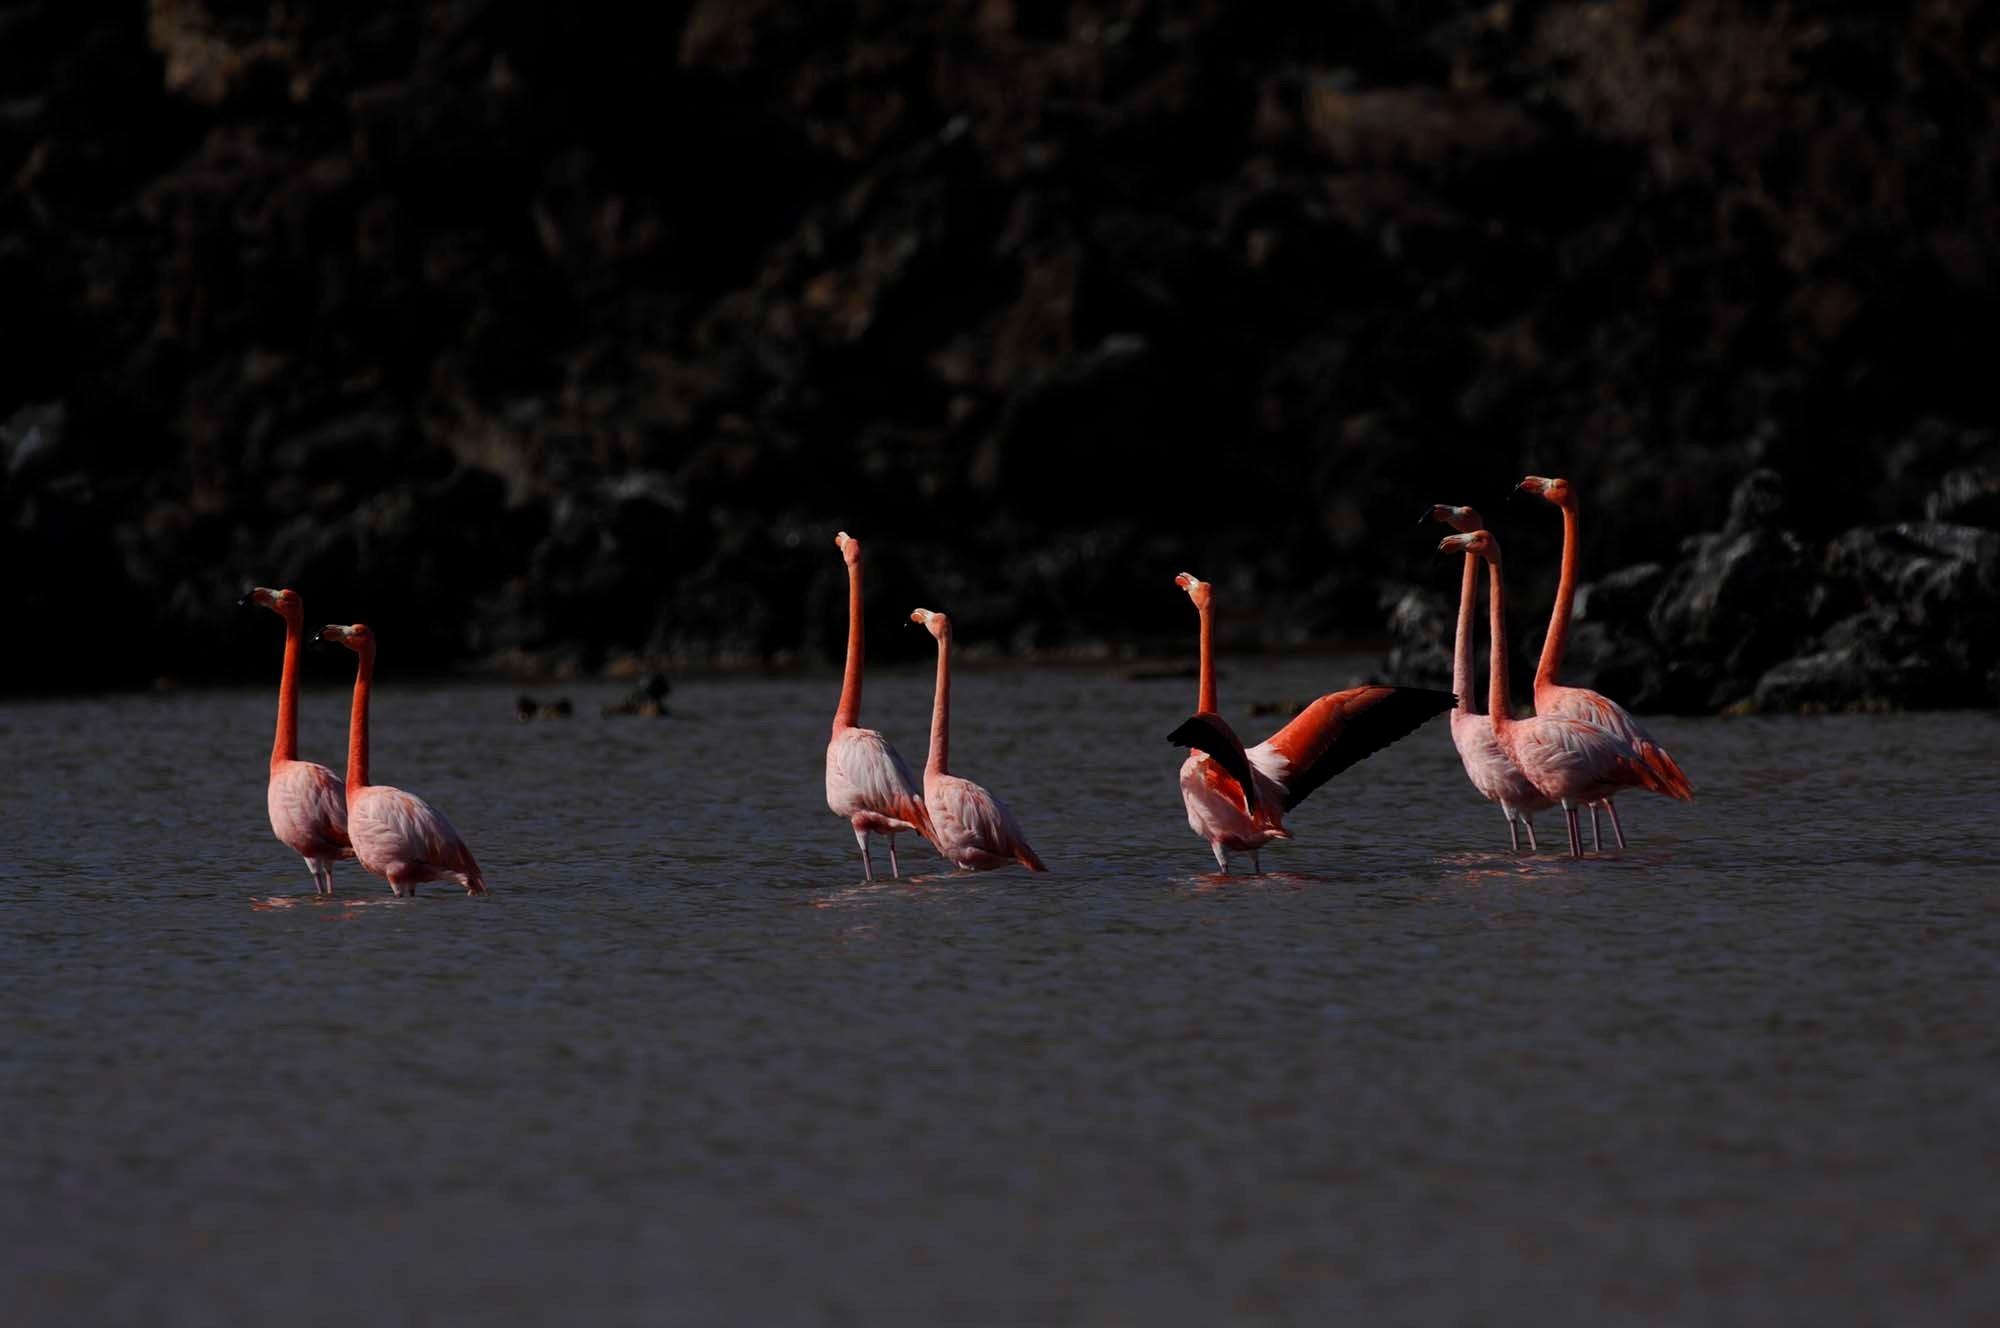 Flamingos Lagoon | Galapagos islands | South America Travel